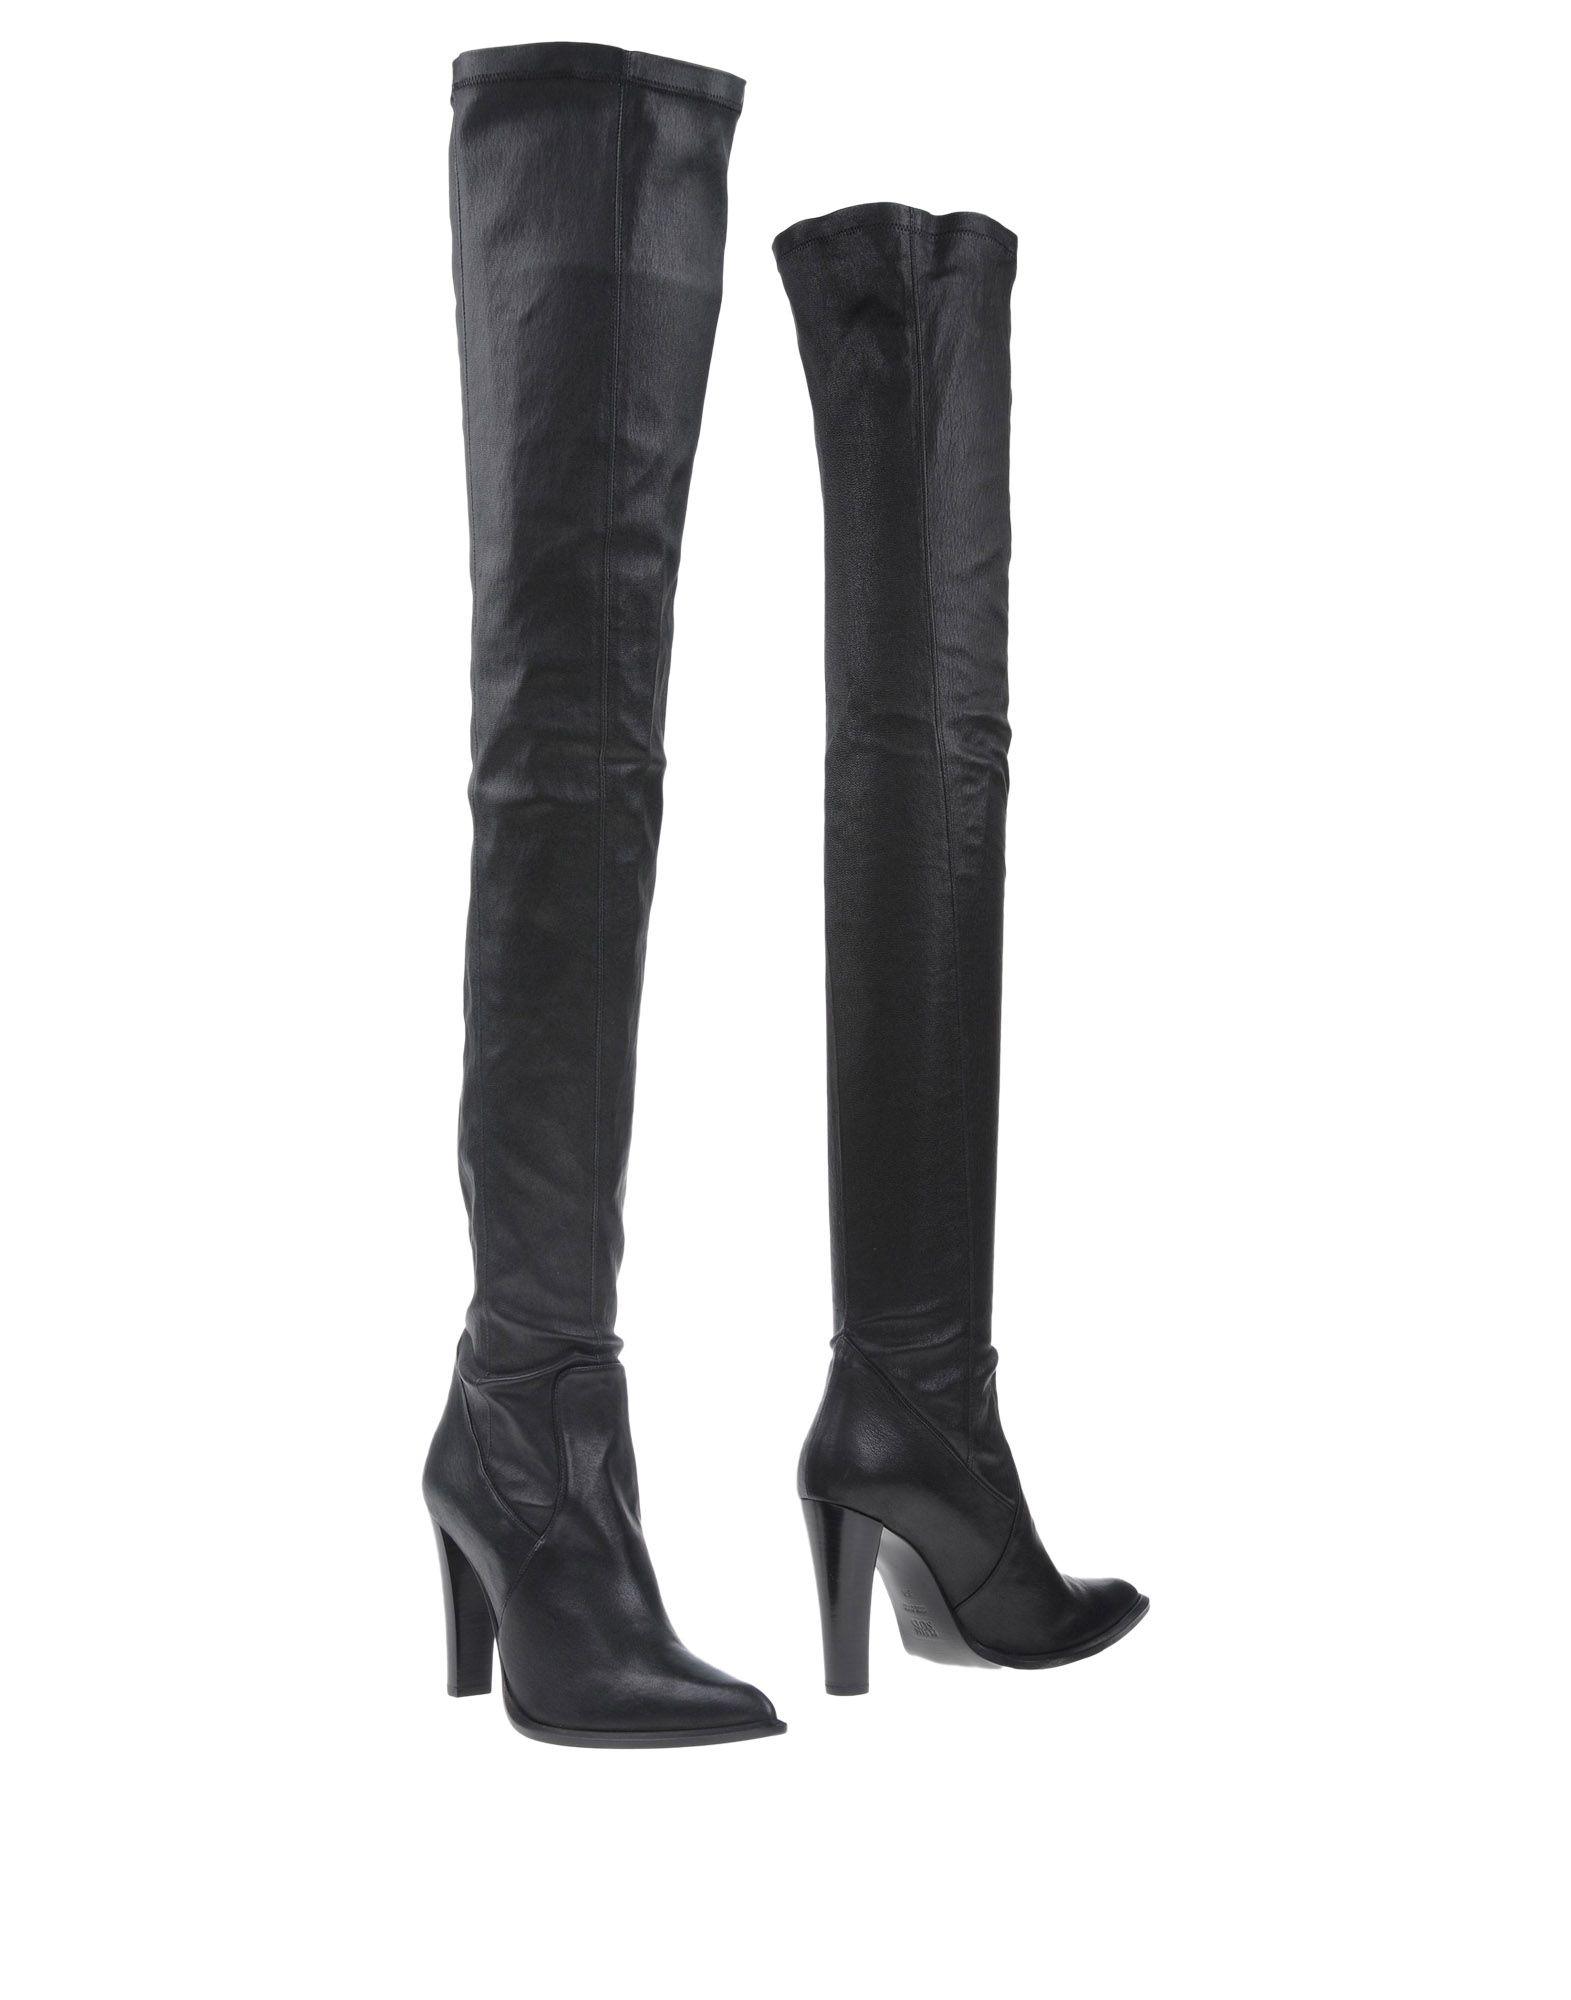 Plein Sud Boots - Women Plein Sud Boots online 11340874HB on  Australia - 11340874HB online 7dea6c